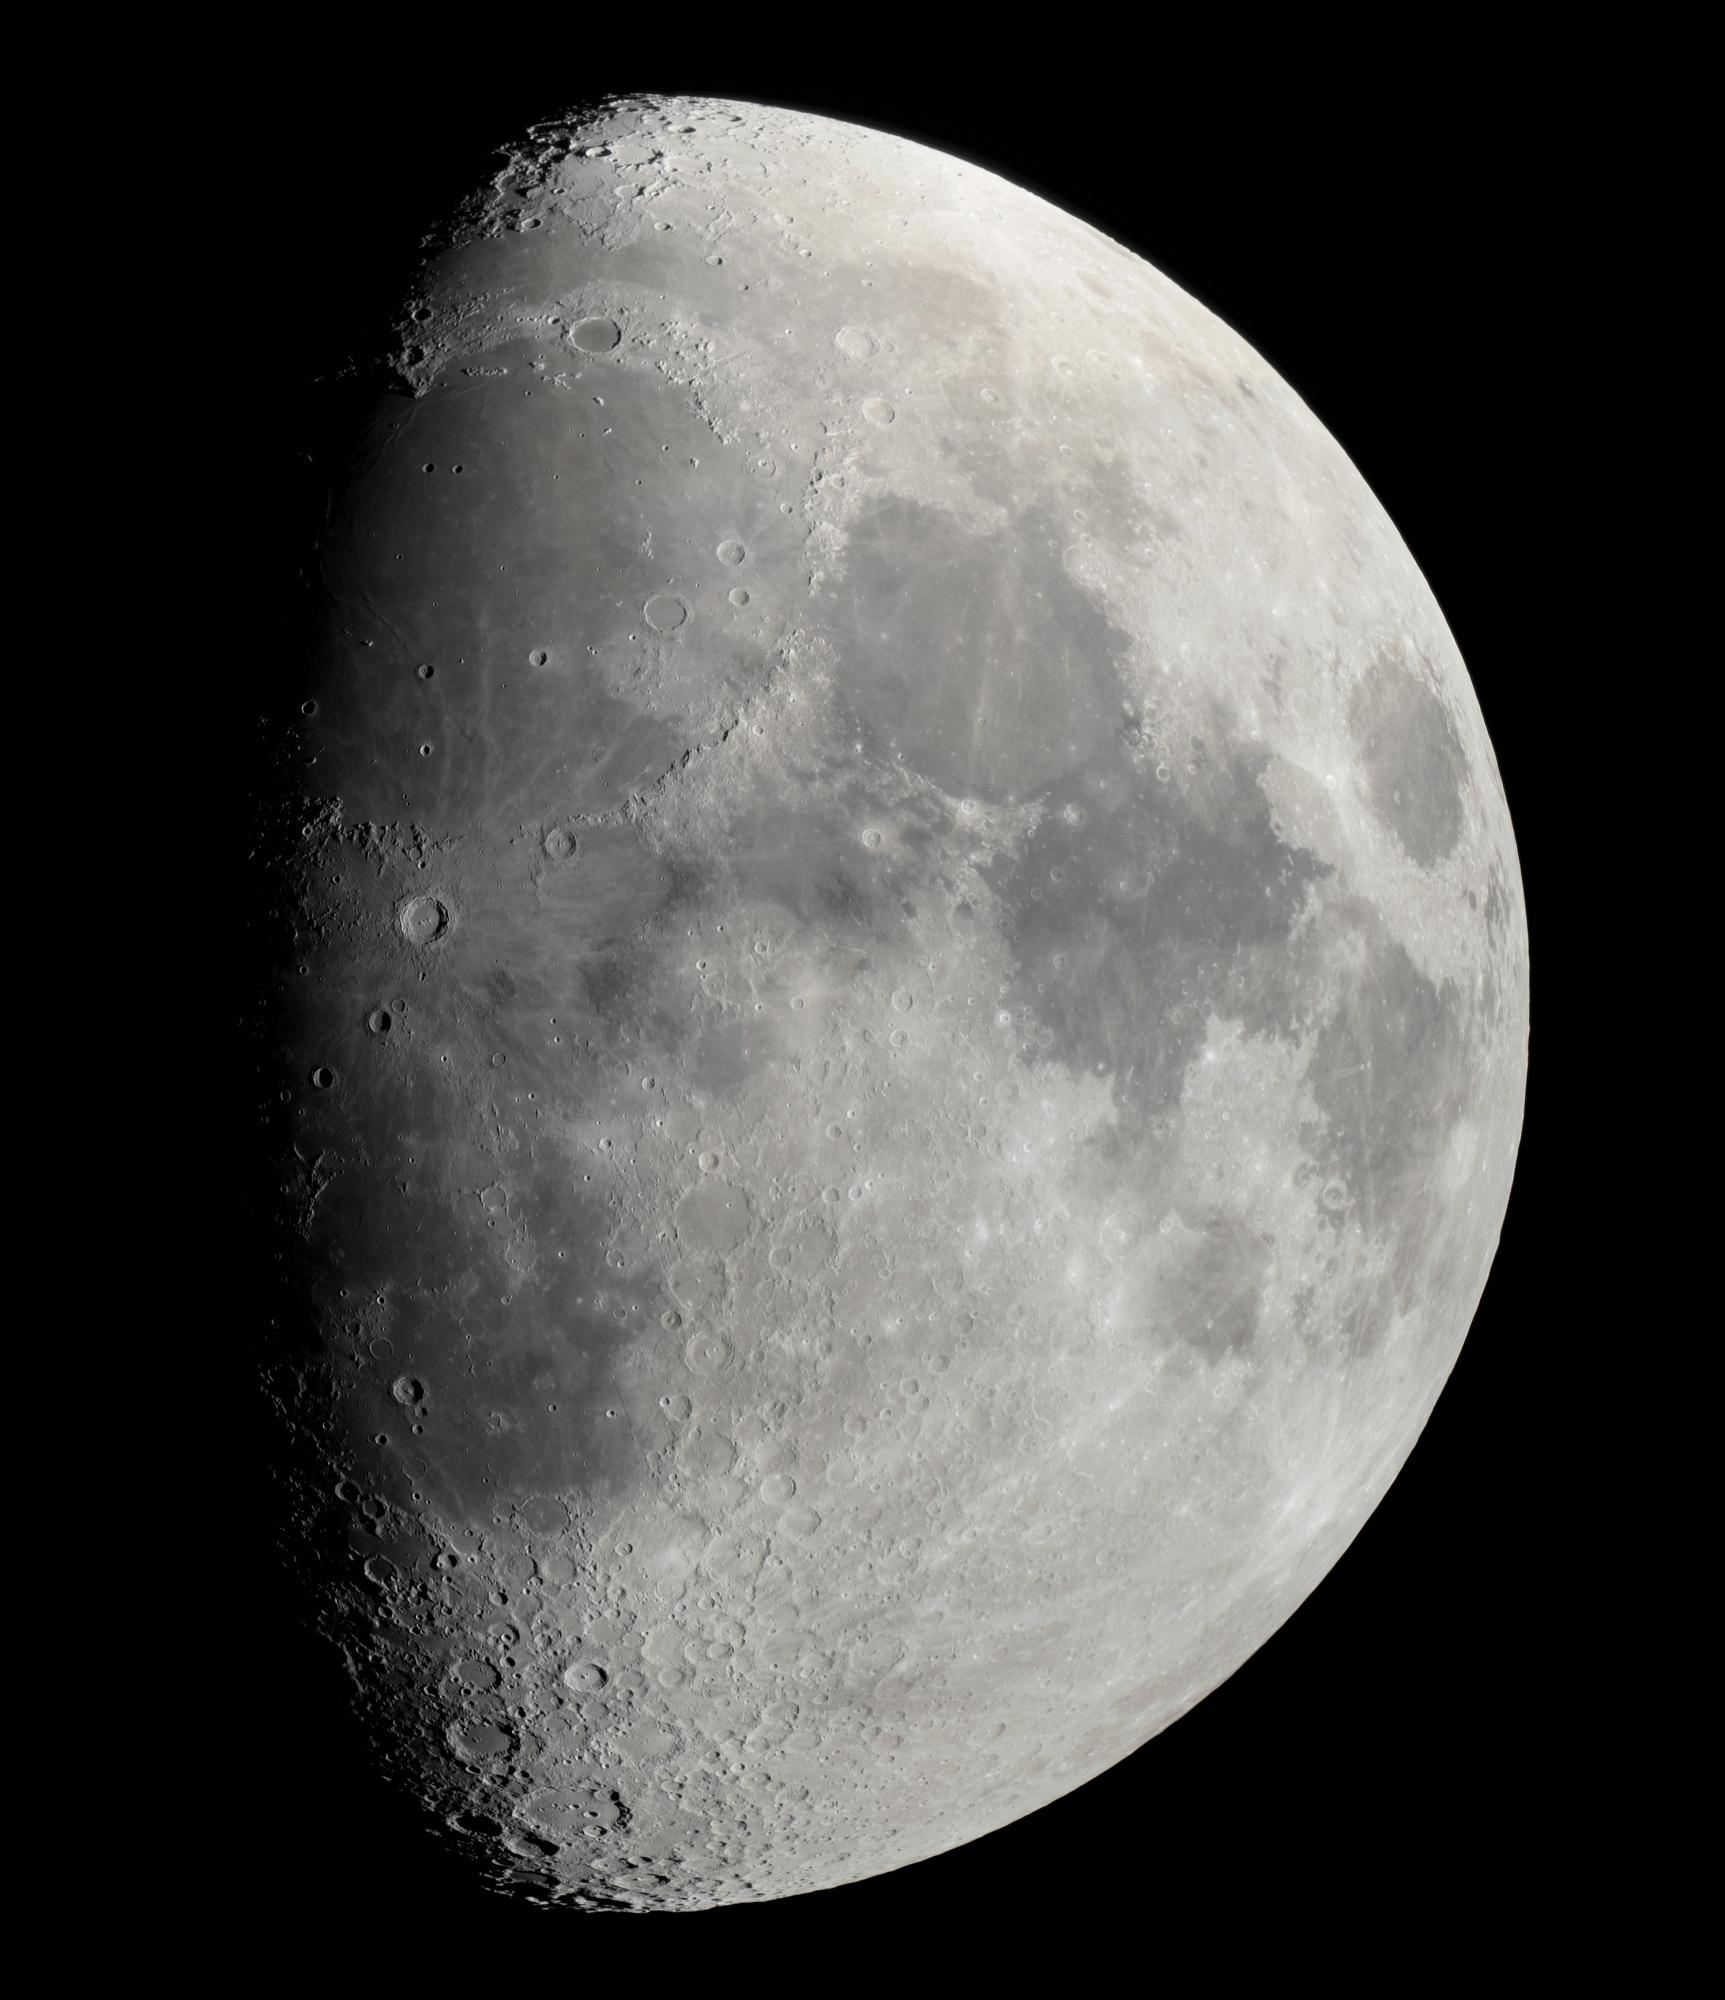 lune140219(t250-sonya7s).thumb.jpg.8d3feabb4af673b81a1b637dc75ec86a.jpg